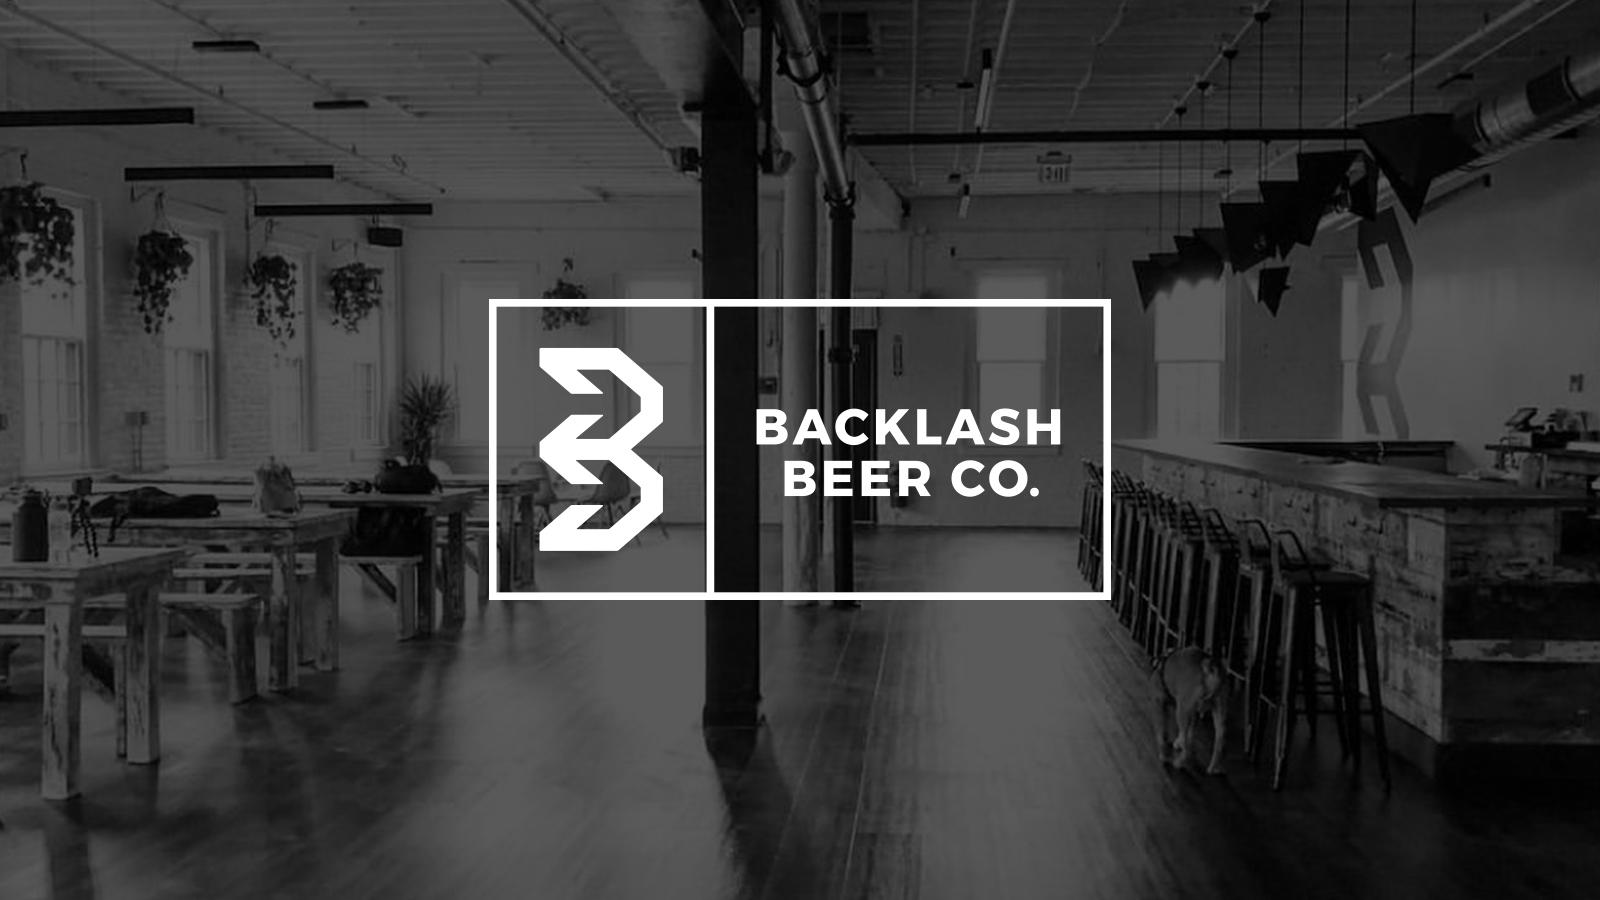 Backlash_Brewery+logo.jpg